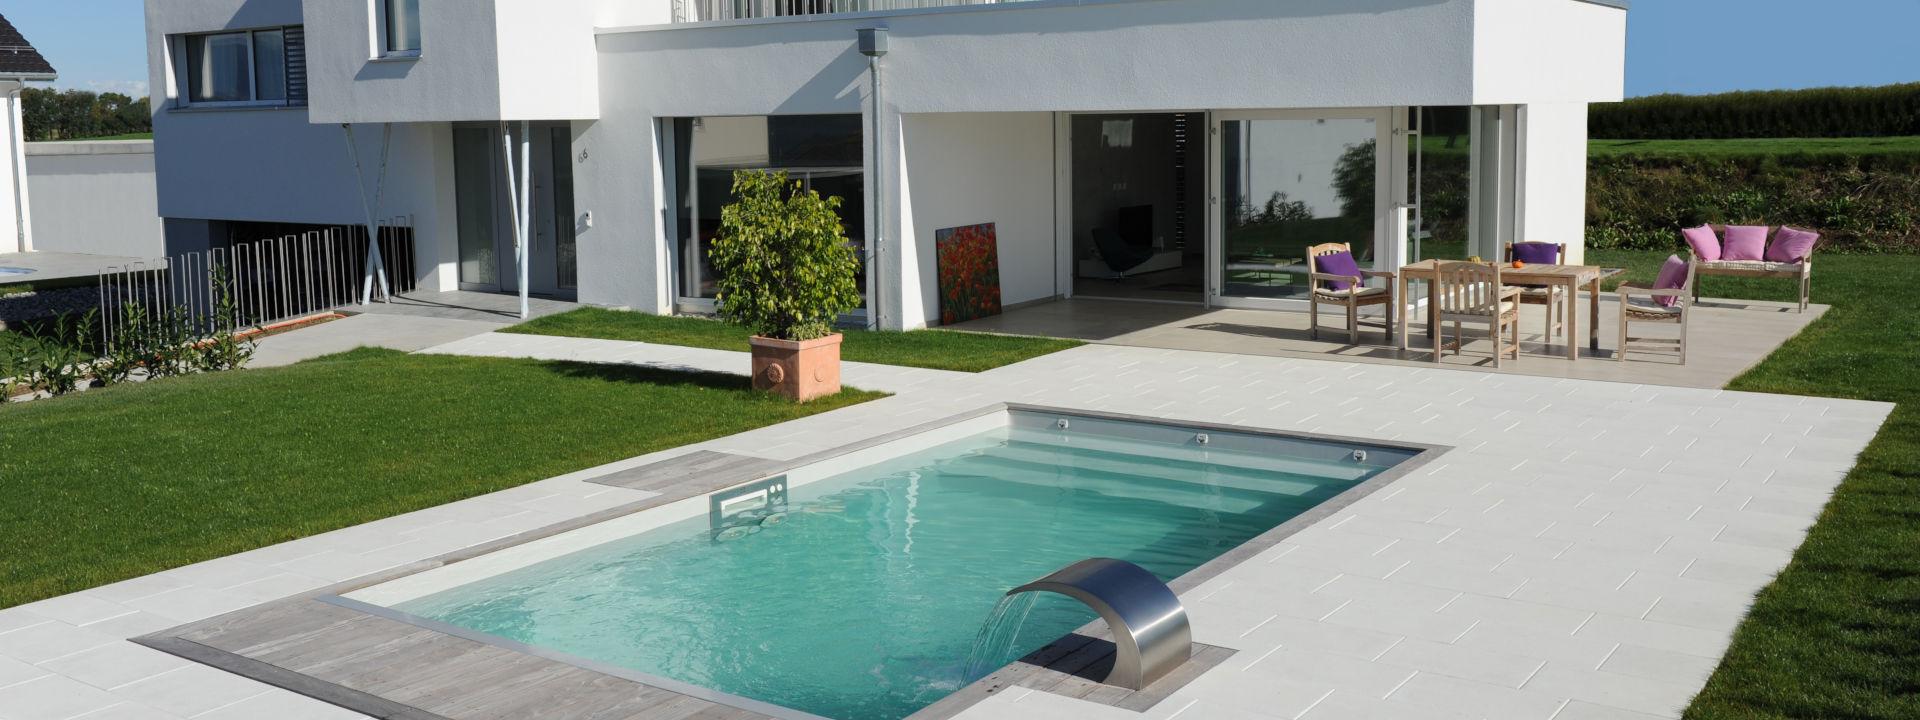 Piscinelle : Fabricant de piscines éco-design